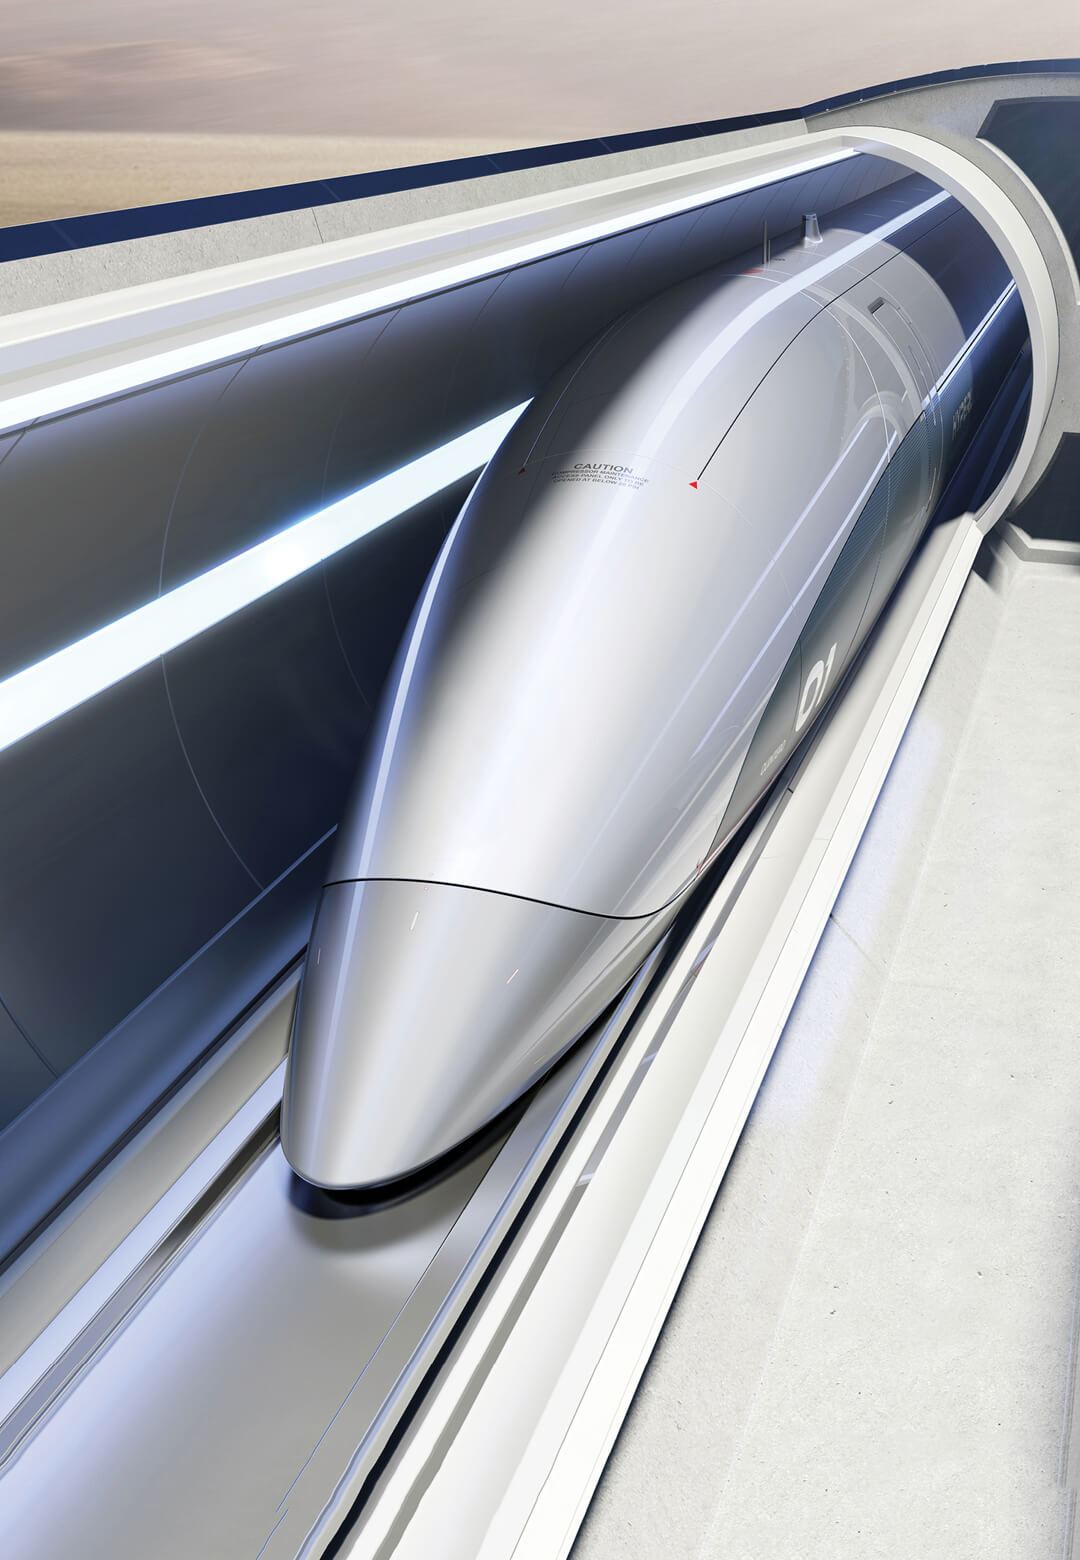 Zaha Hadid Architects has partnered with Hyperloop Italia to jointly design its next phase of works | ZHA x Hyperloop Italia | STIRworld